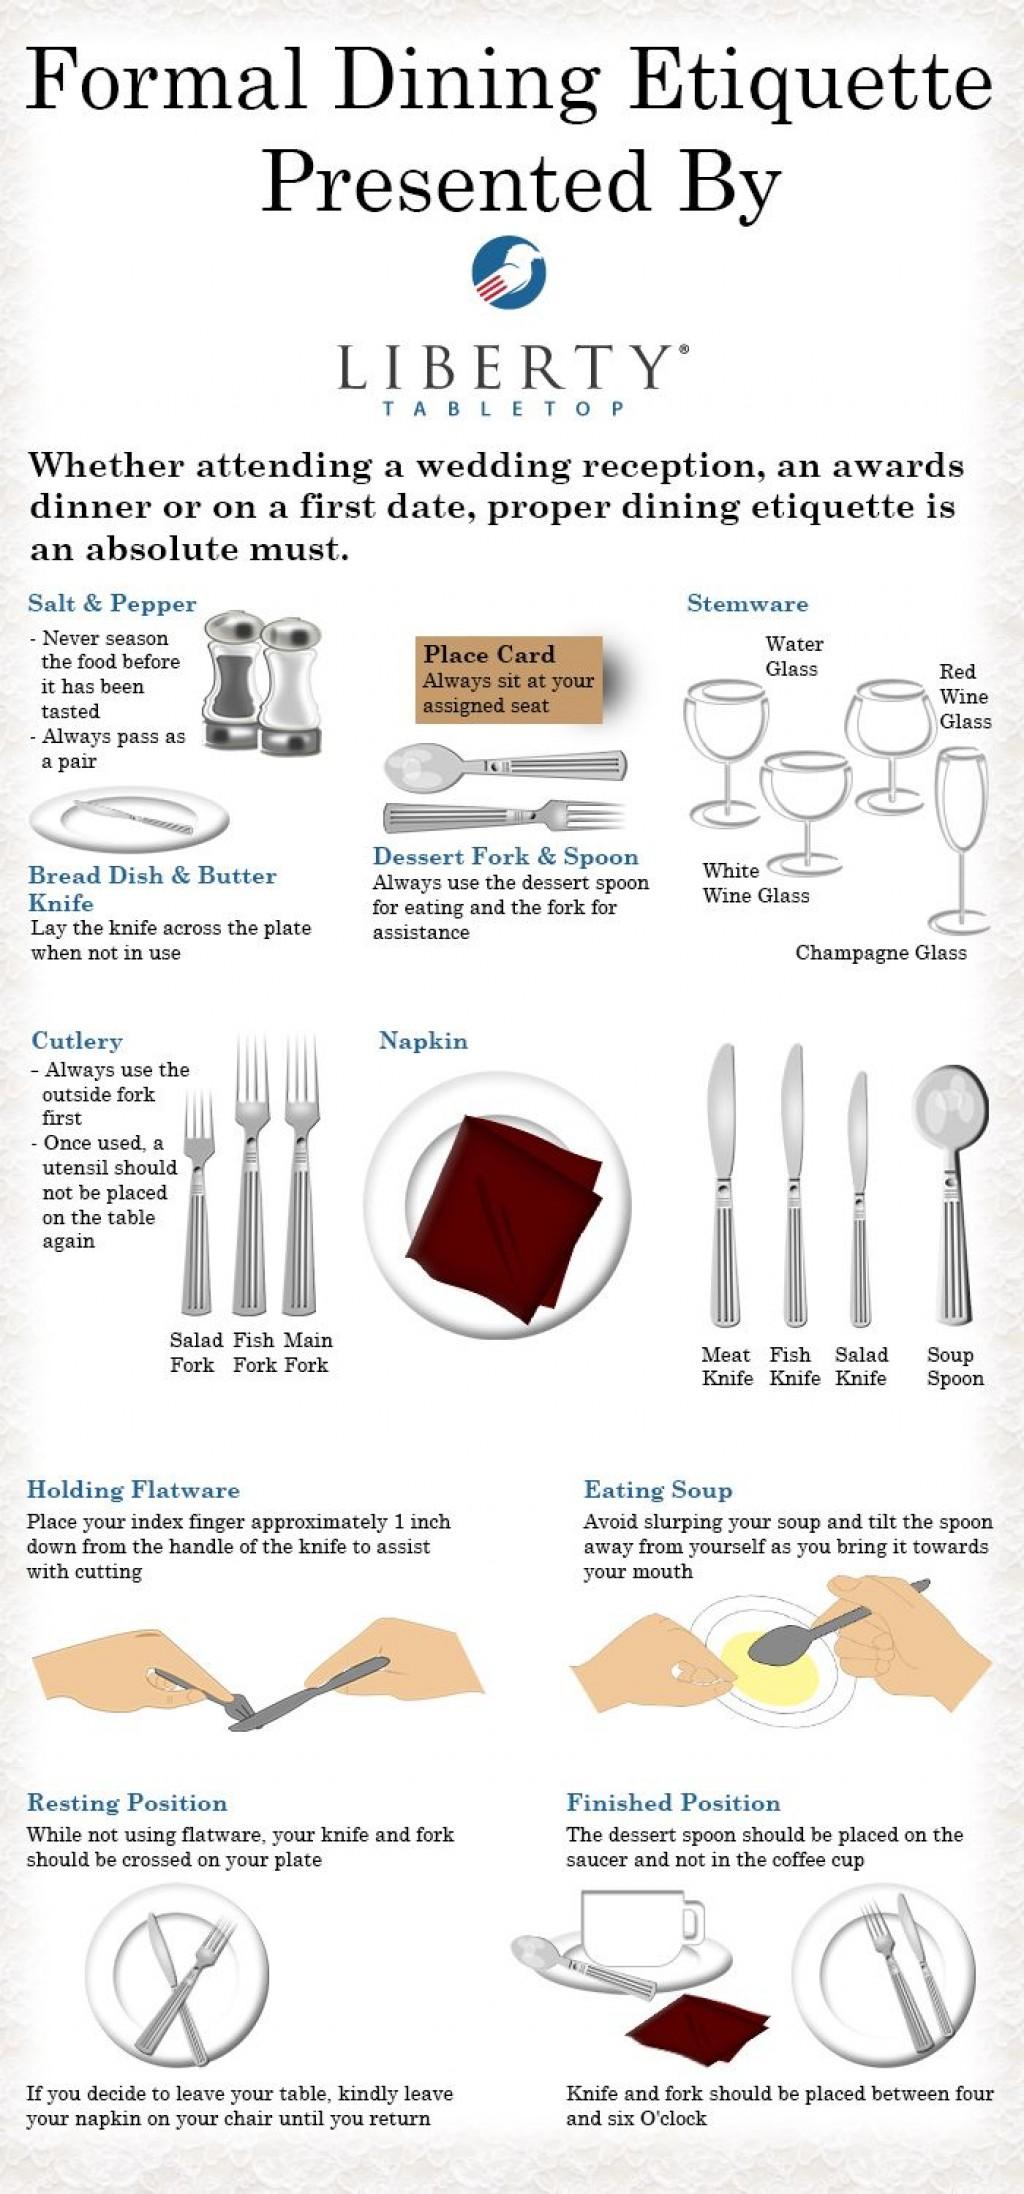 010 Basic Table Manners Essay Wonderful Large